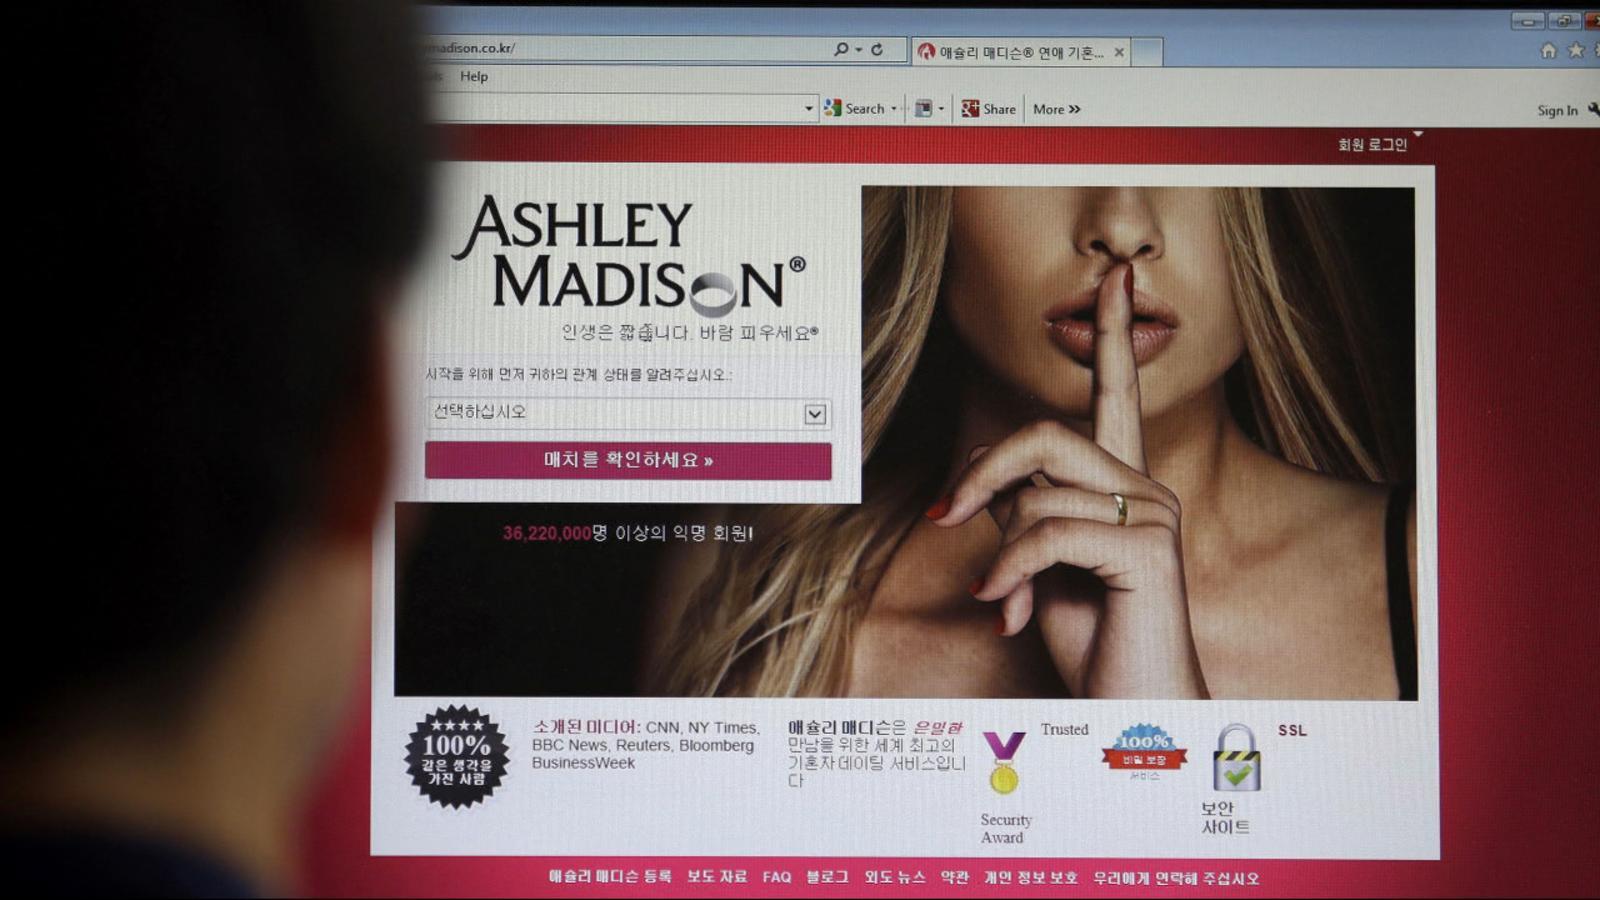 ashley madison dating site toronto